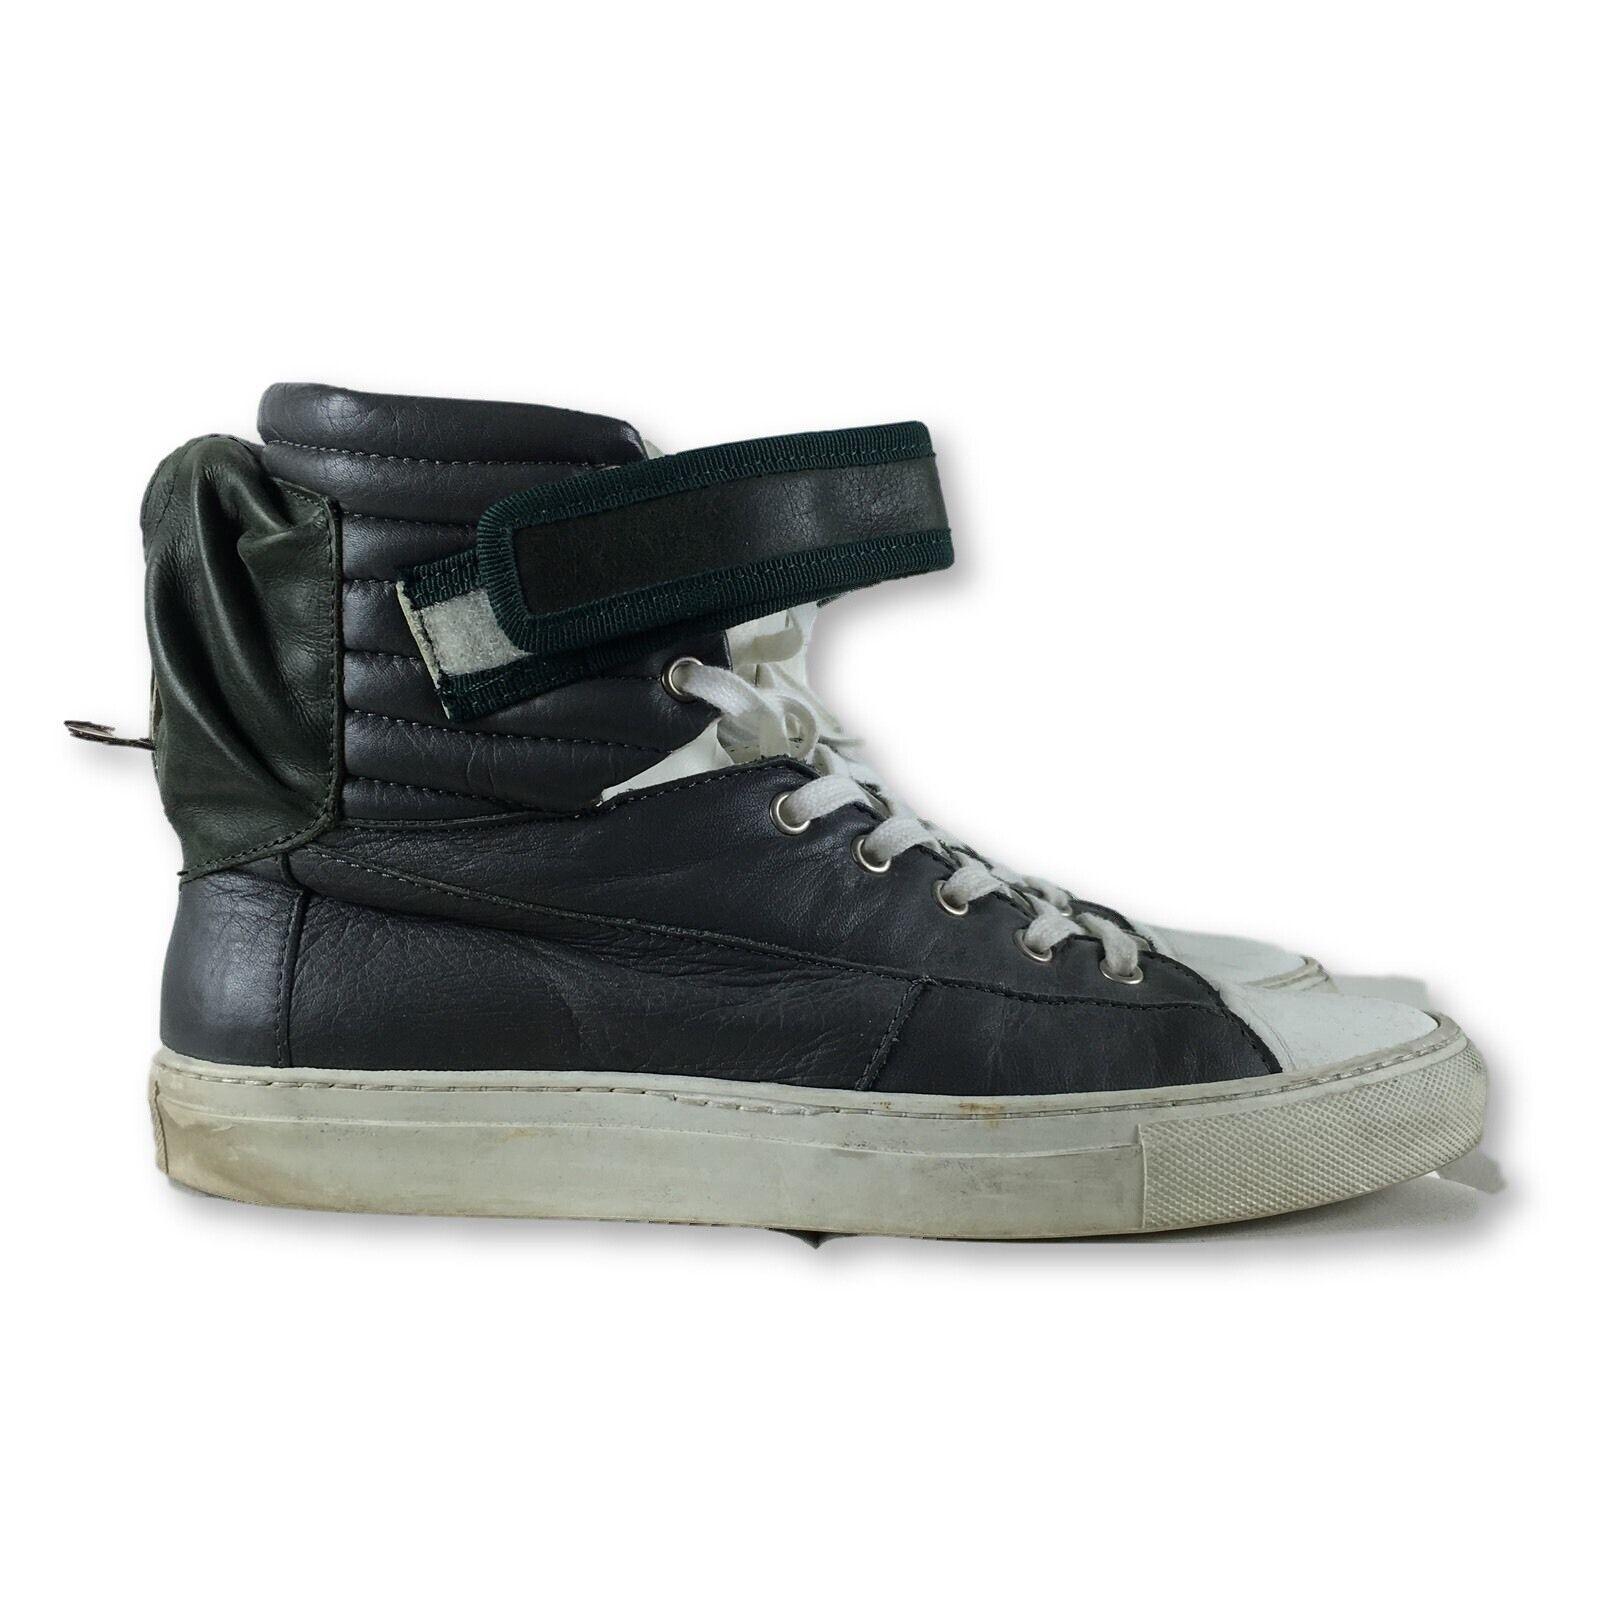 PRE -OwneD - Raf  Simons Raffros Leather scarpe da ginnastica 2010 - Dimensione EU 40  gli ultimi modelli